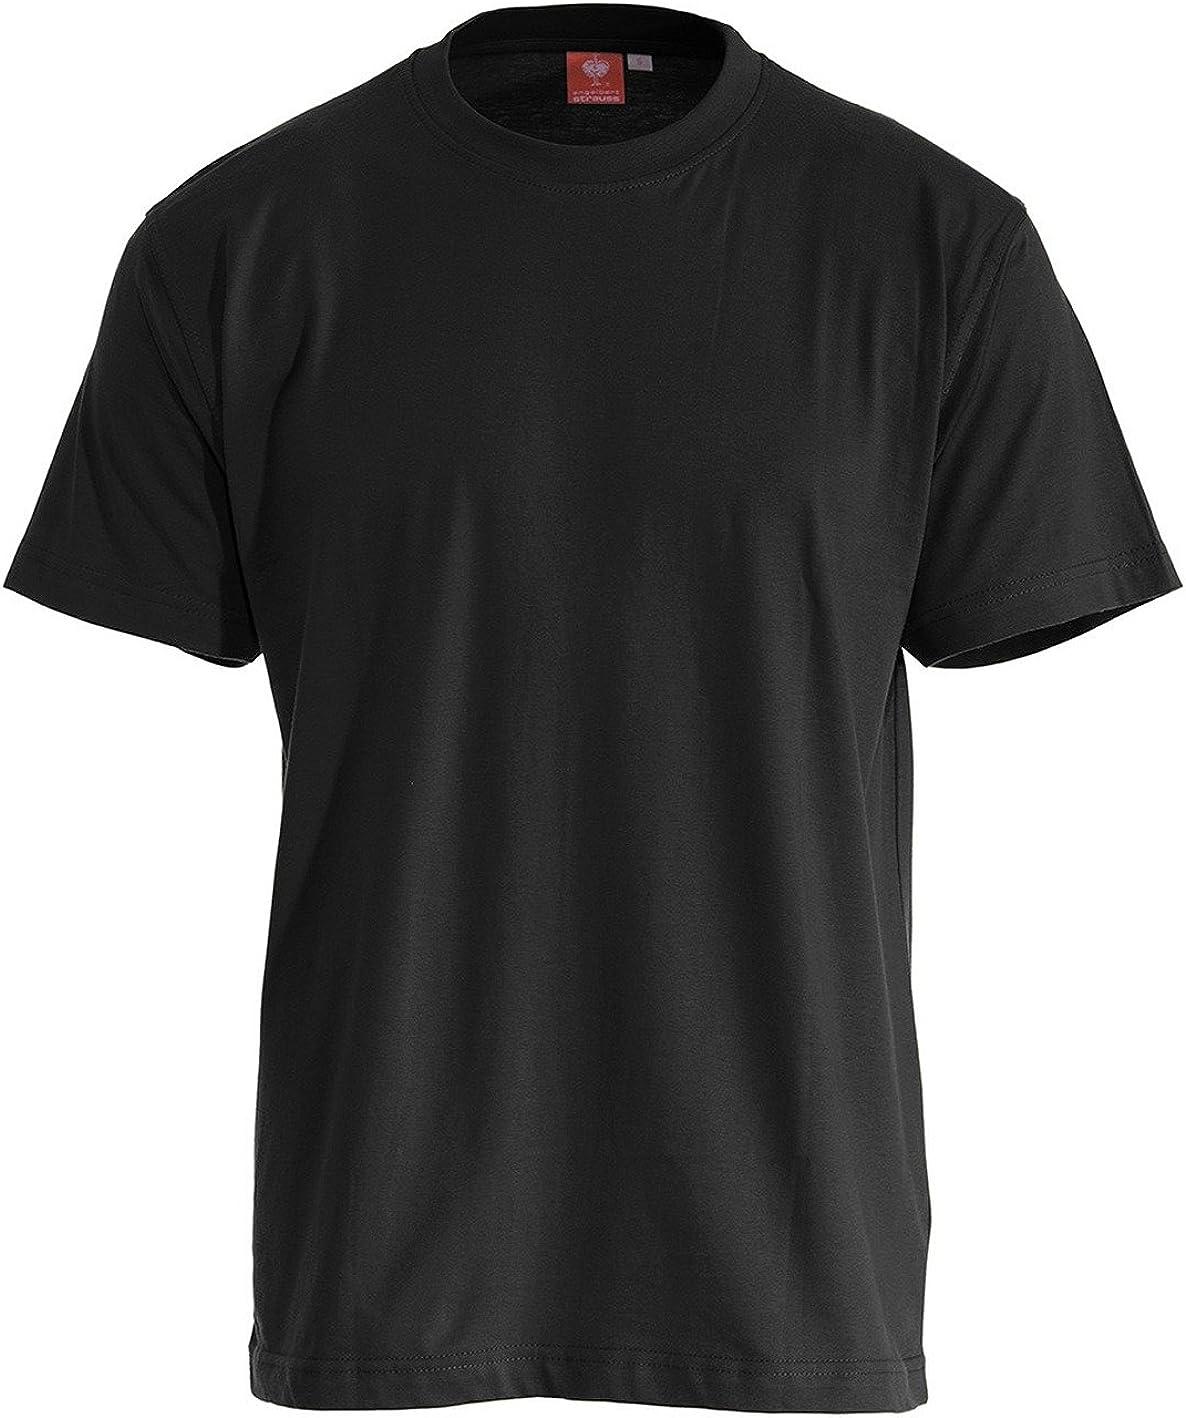 Camiseta Engelbert Strauss, Color: Negro, Talla: L